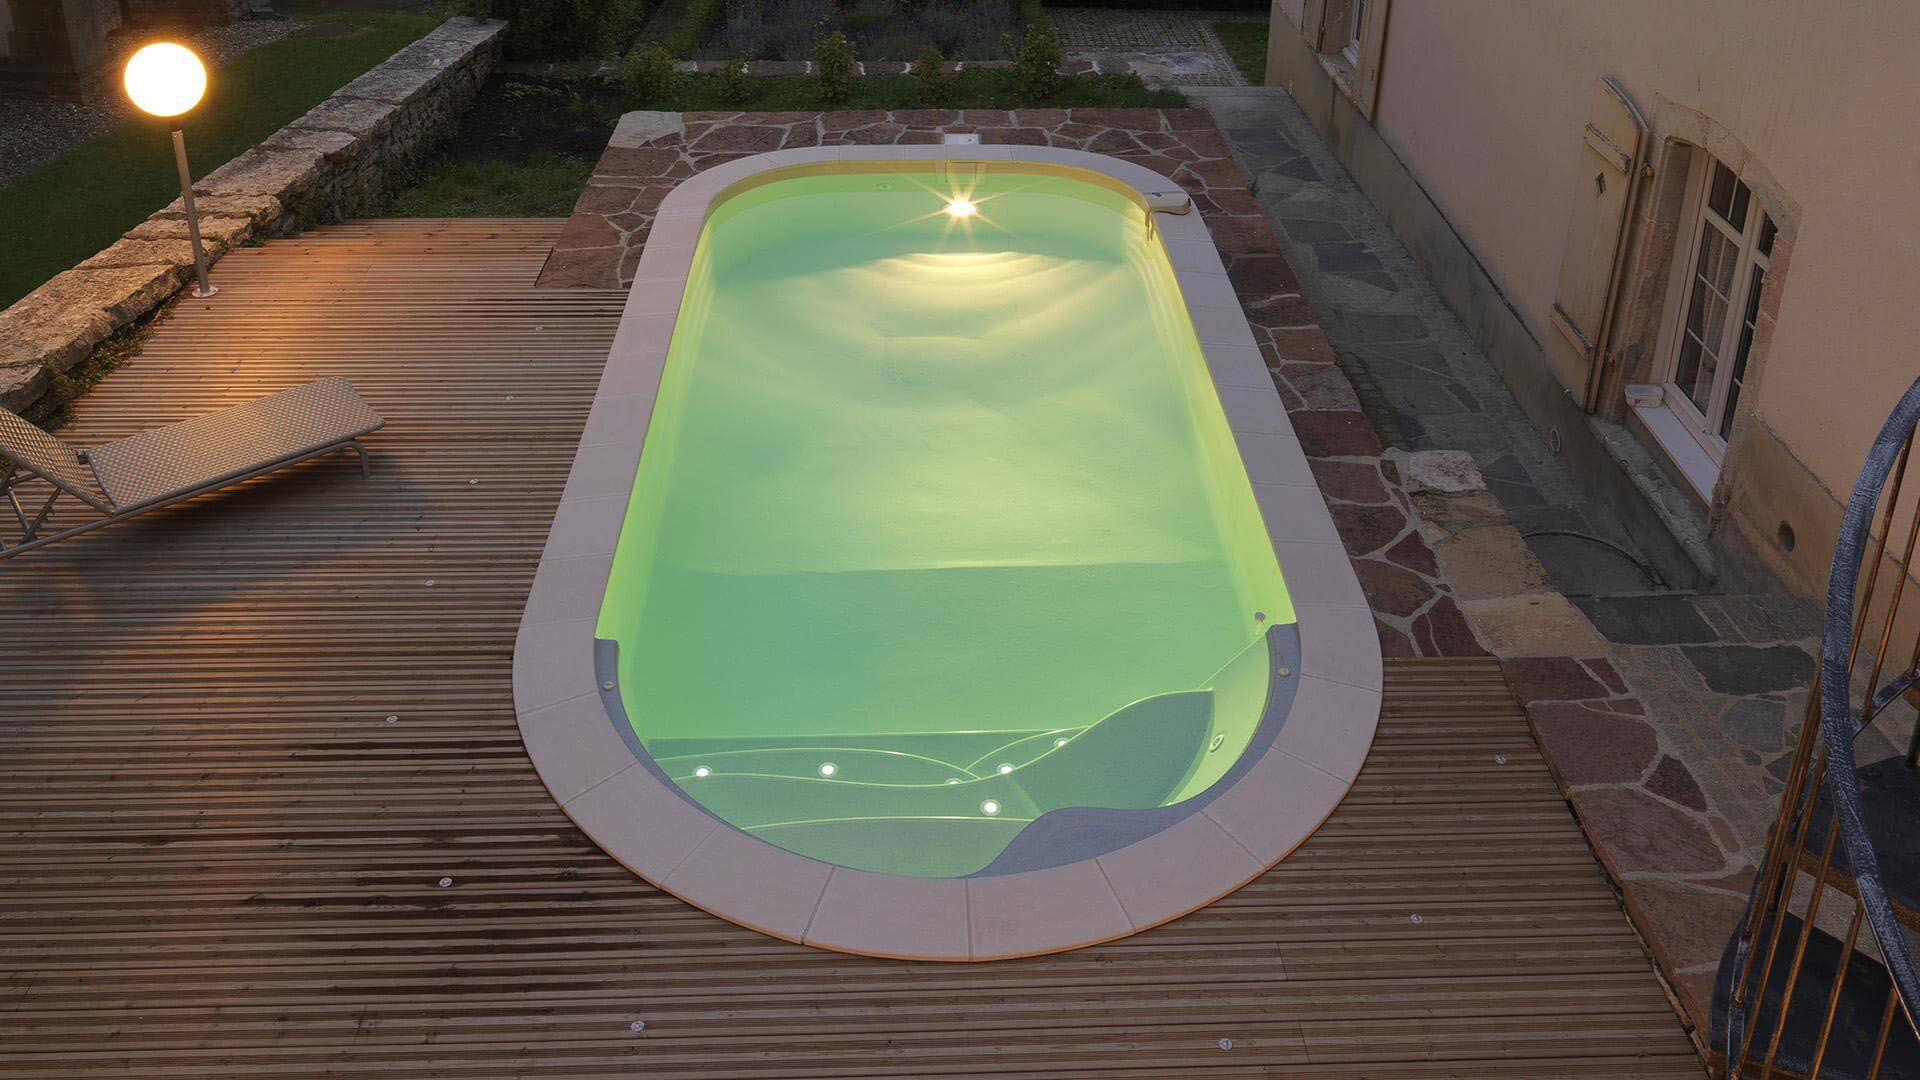 PRS-piscine-forme-libre-luna-ESCALIER